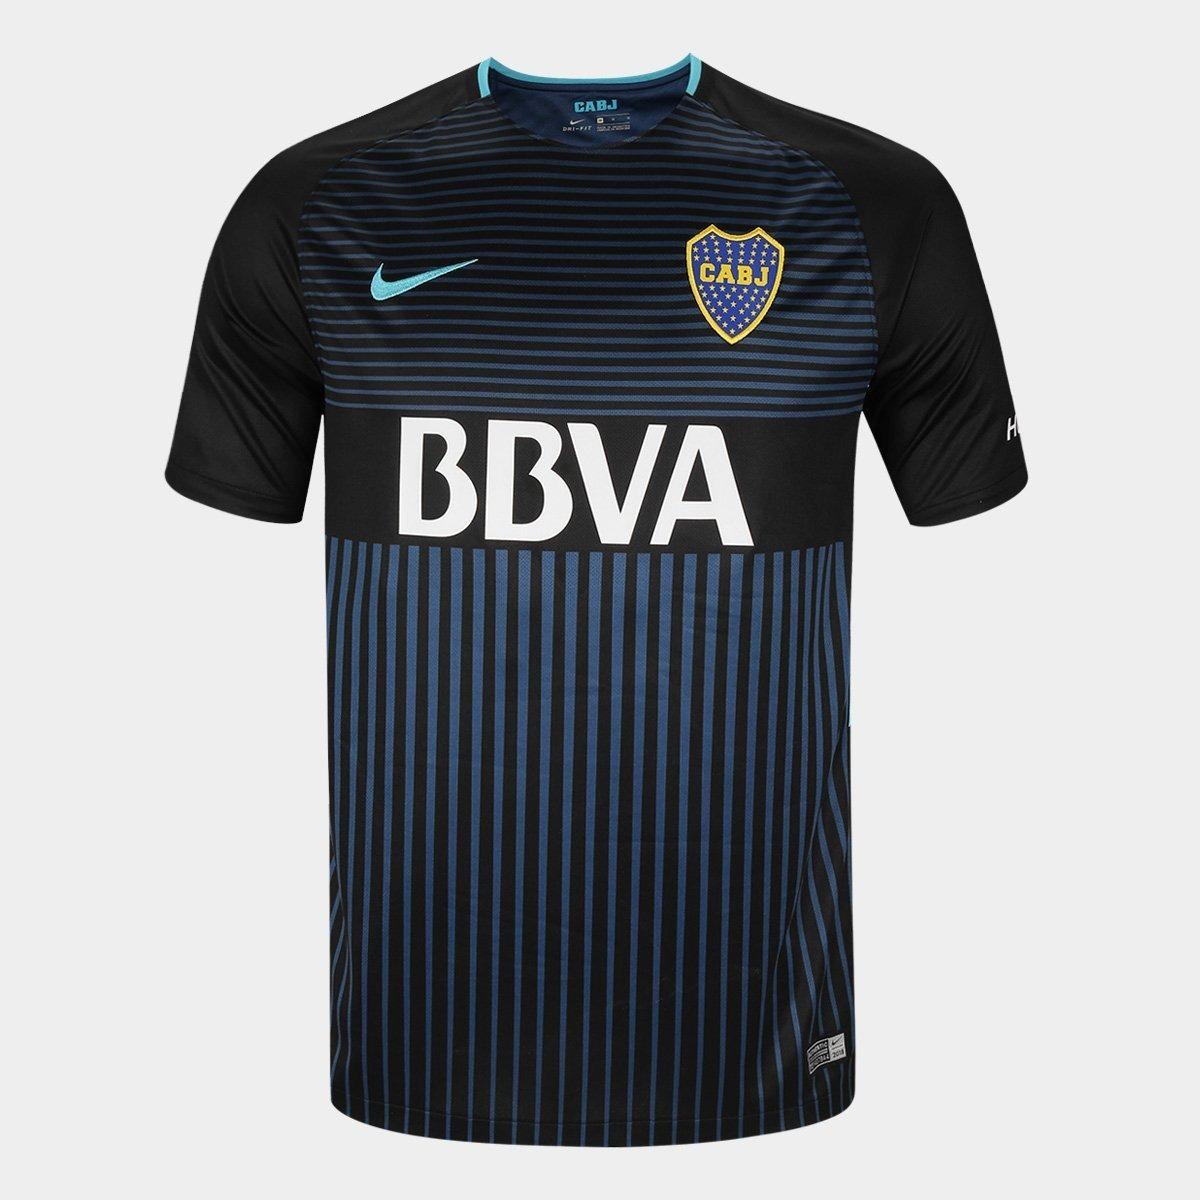 camiseta nike boca juniors alternativa 3 match - 2018. Cargando zoom. ee75752b9463b